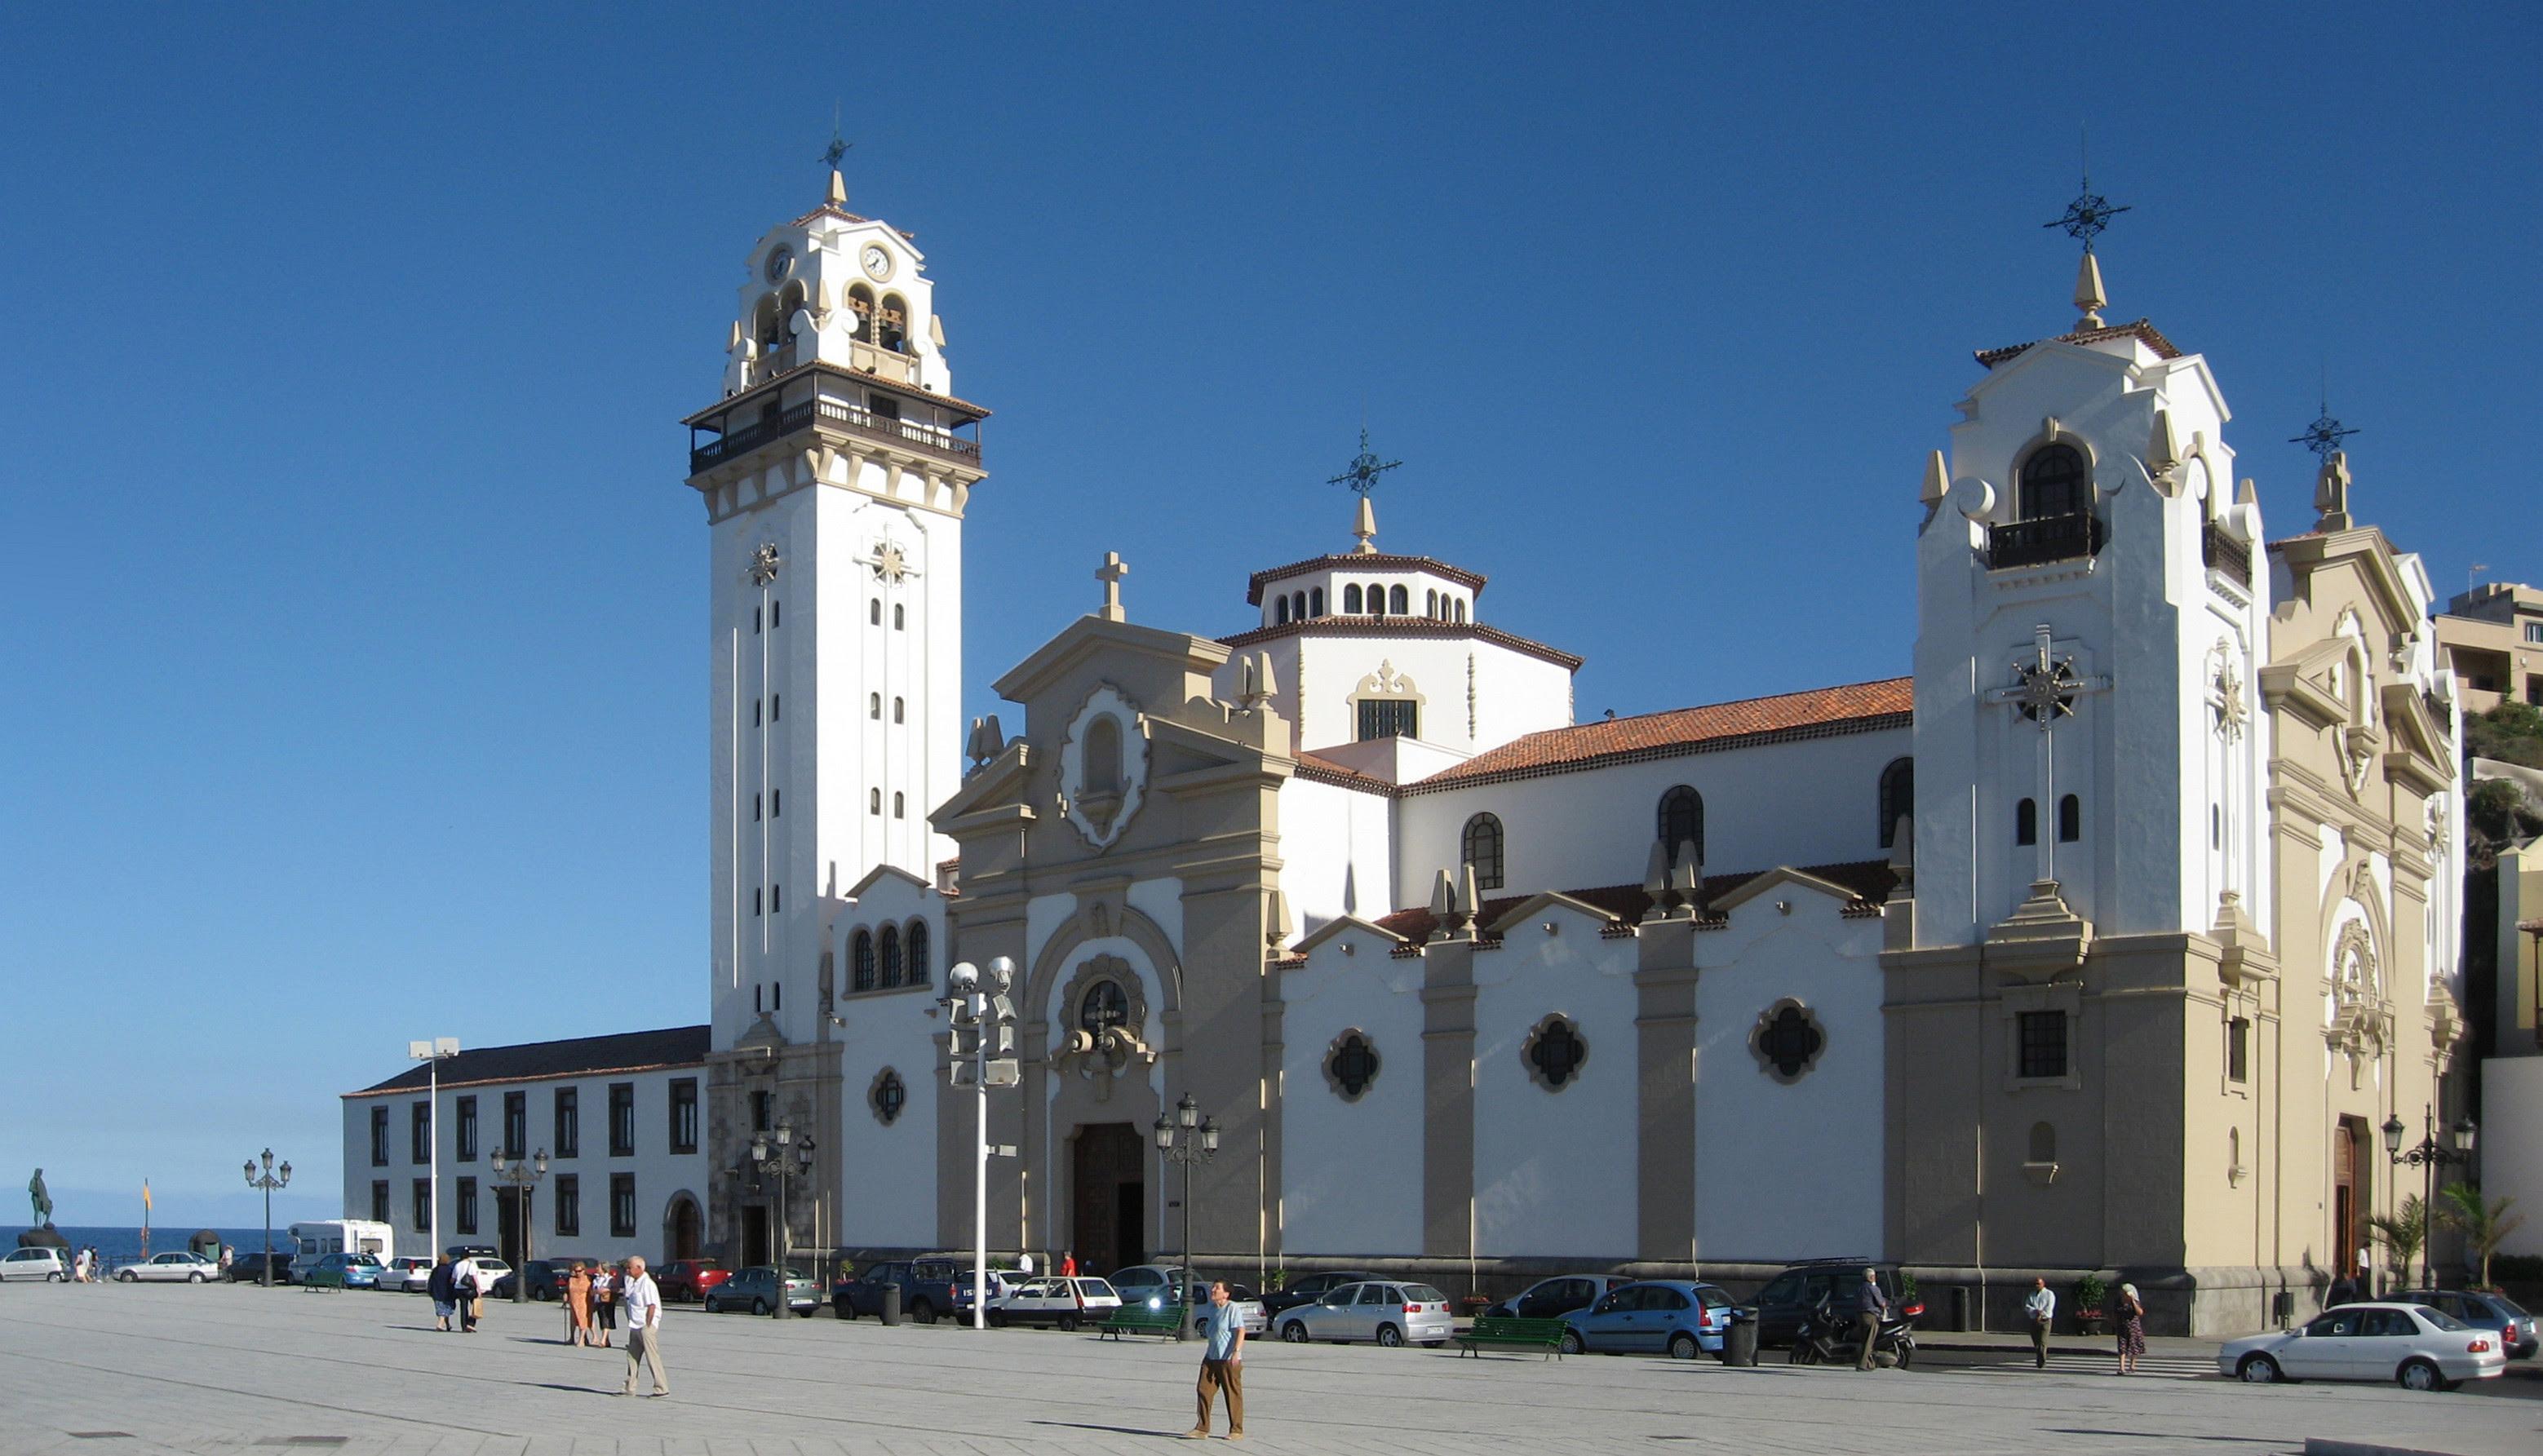 http://upload.wikimedia.org/wikipedia/commons/a/a0/Tenerife.candelaria.exterior.basilica.jpg